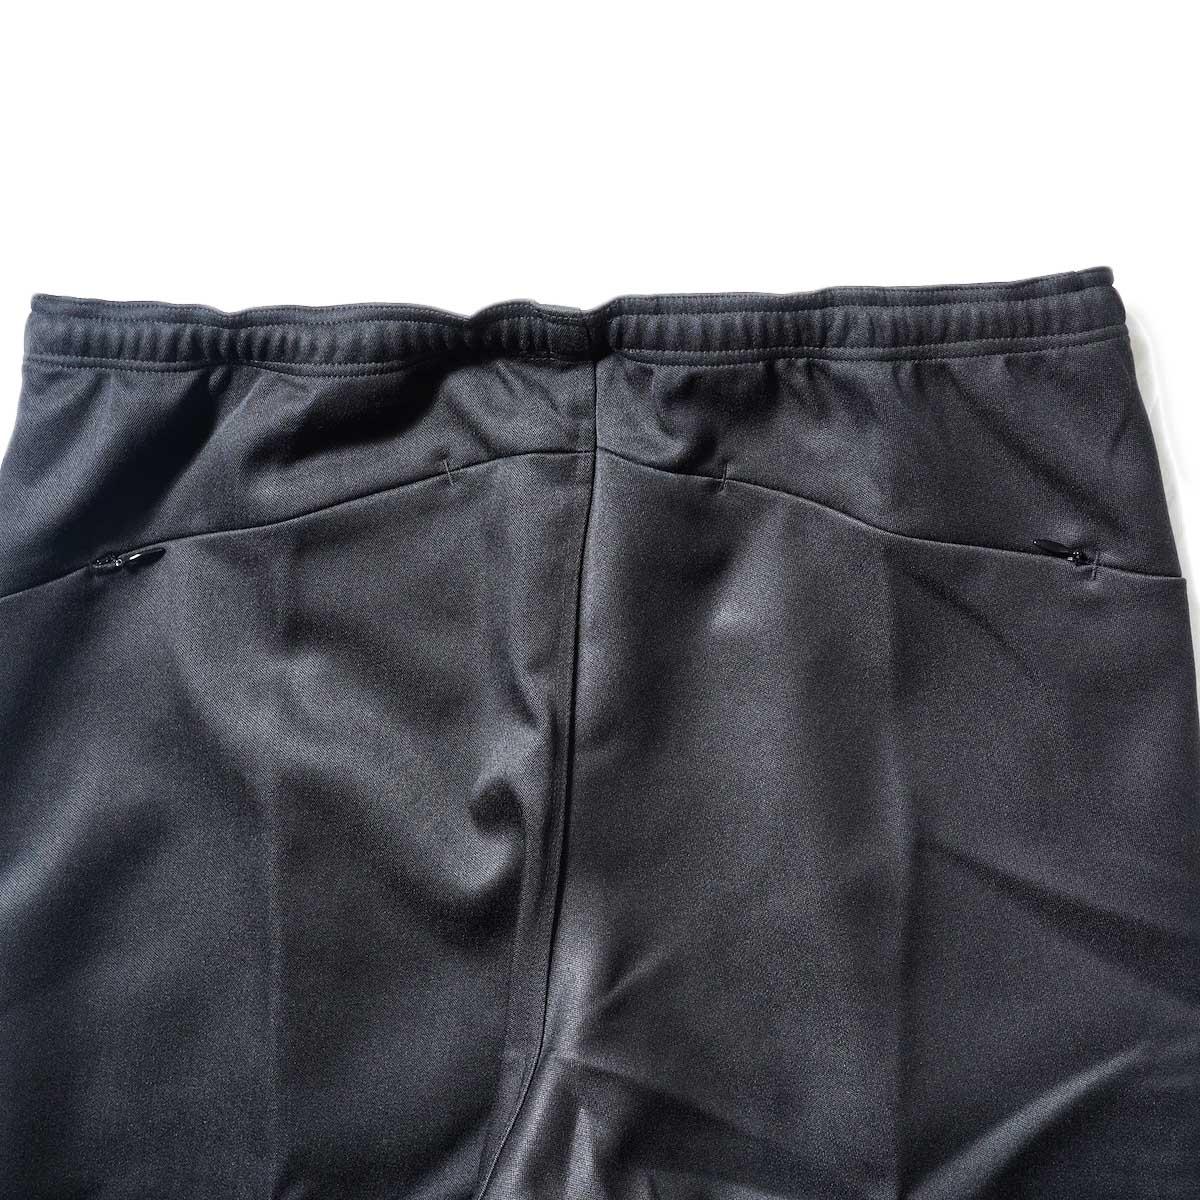 Needles / W.U. BOOT-CUT PANT - PE/R DOESKIN (Black)ヒップポケット